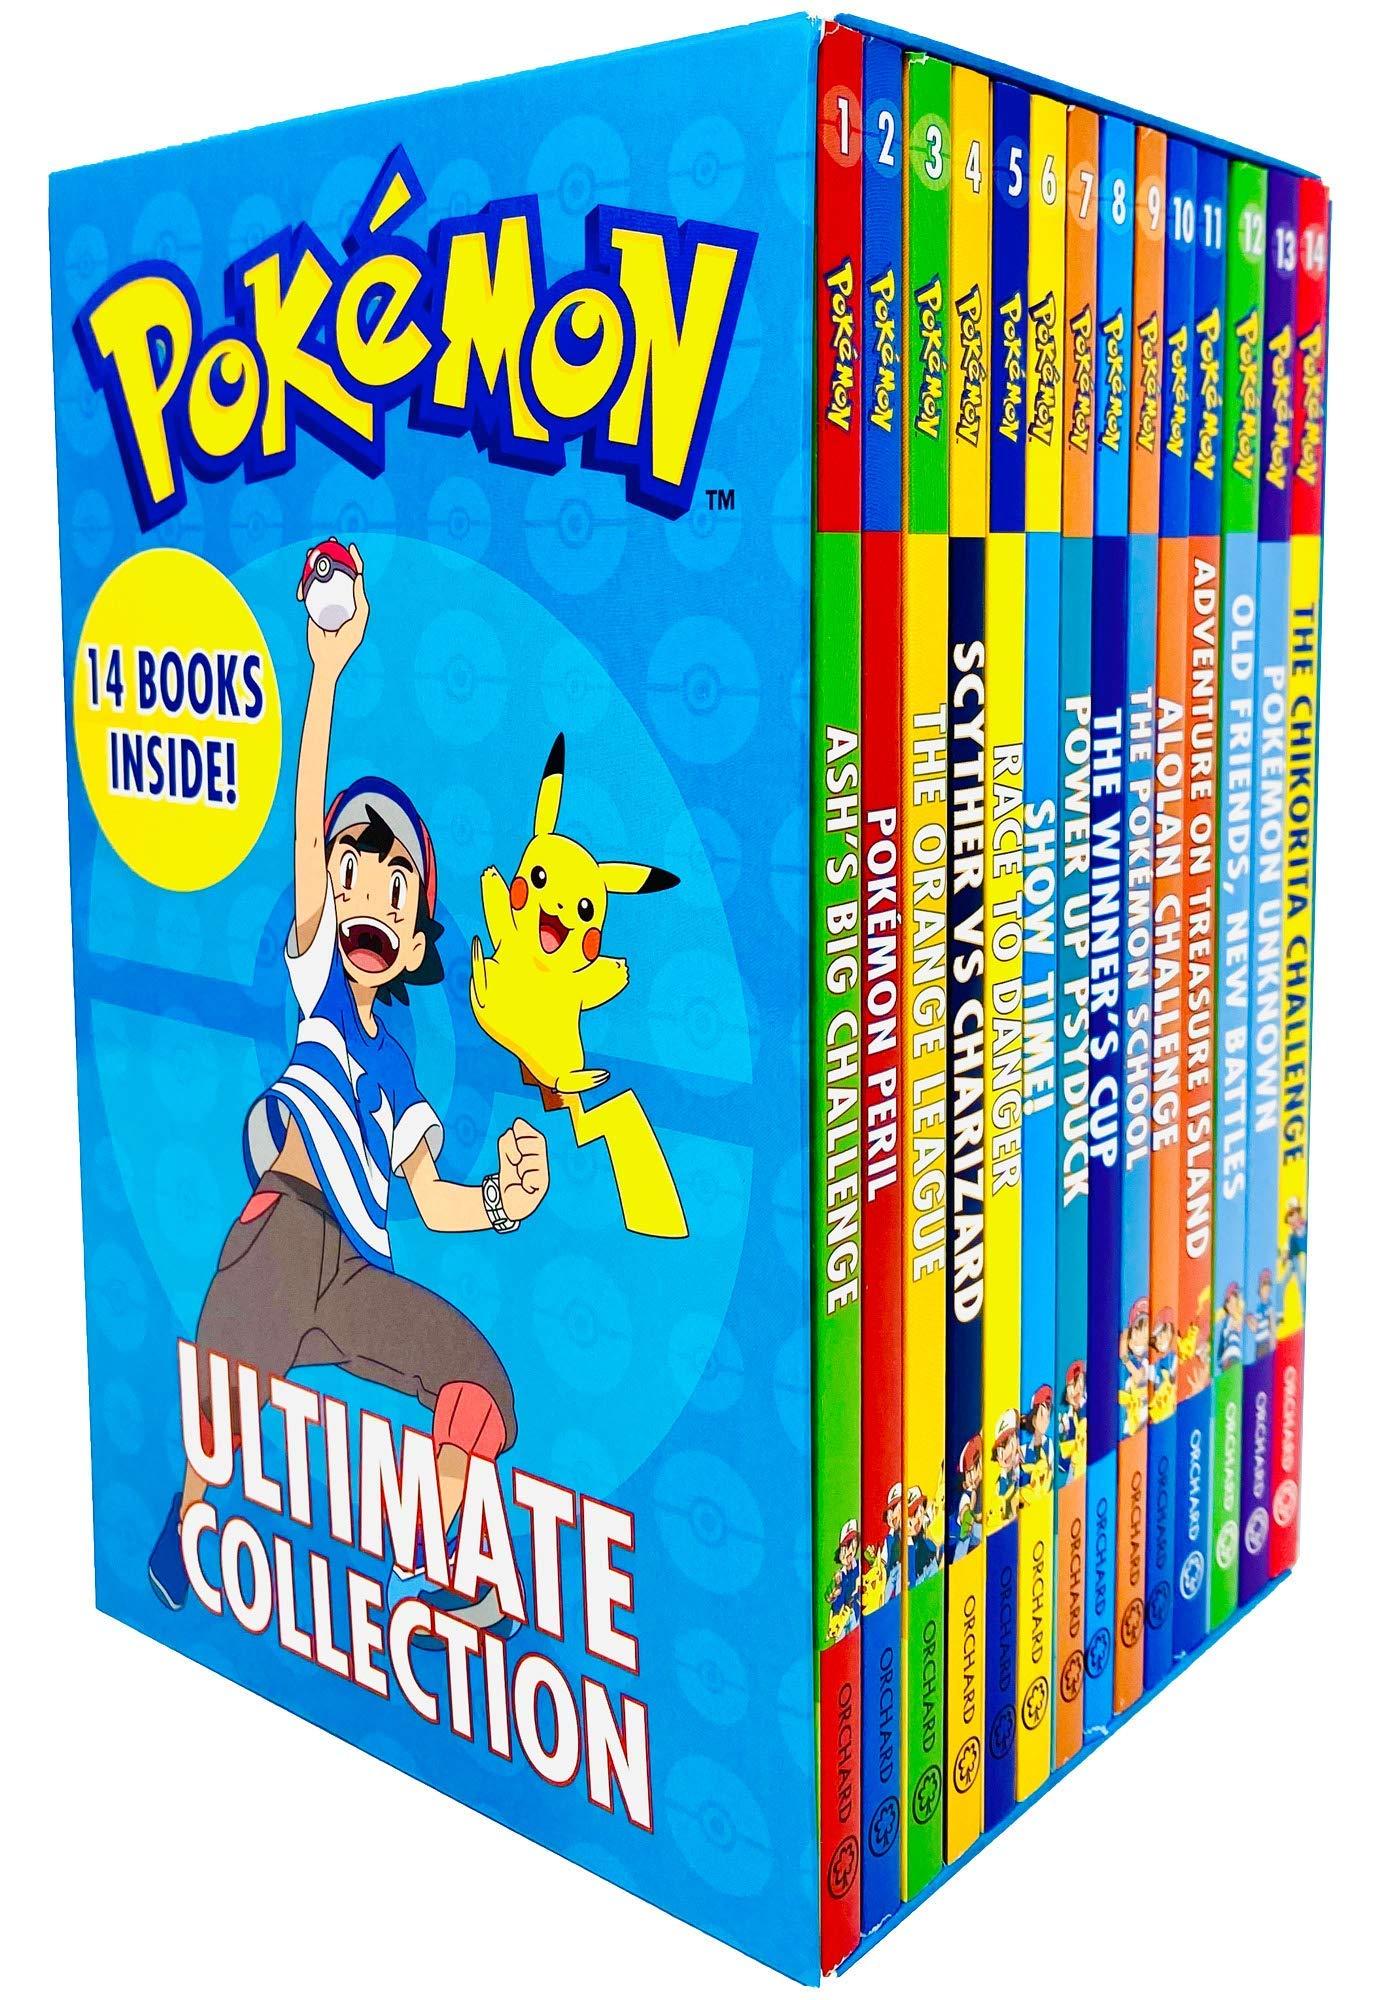 Pokemon Ultimate Collection Series Books 1-14 Set (Ash's Big Challenge, Pokemon Peril, Orange League, Scyther VS Charizard, Race to Danger and MORE!)